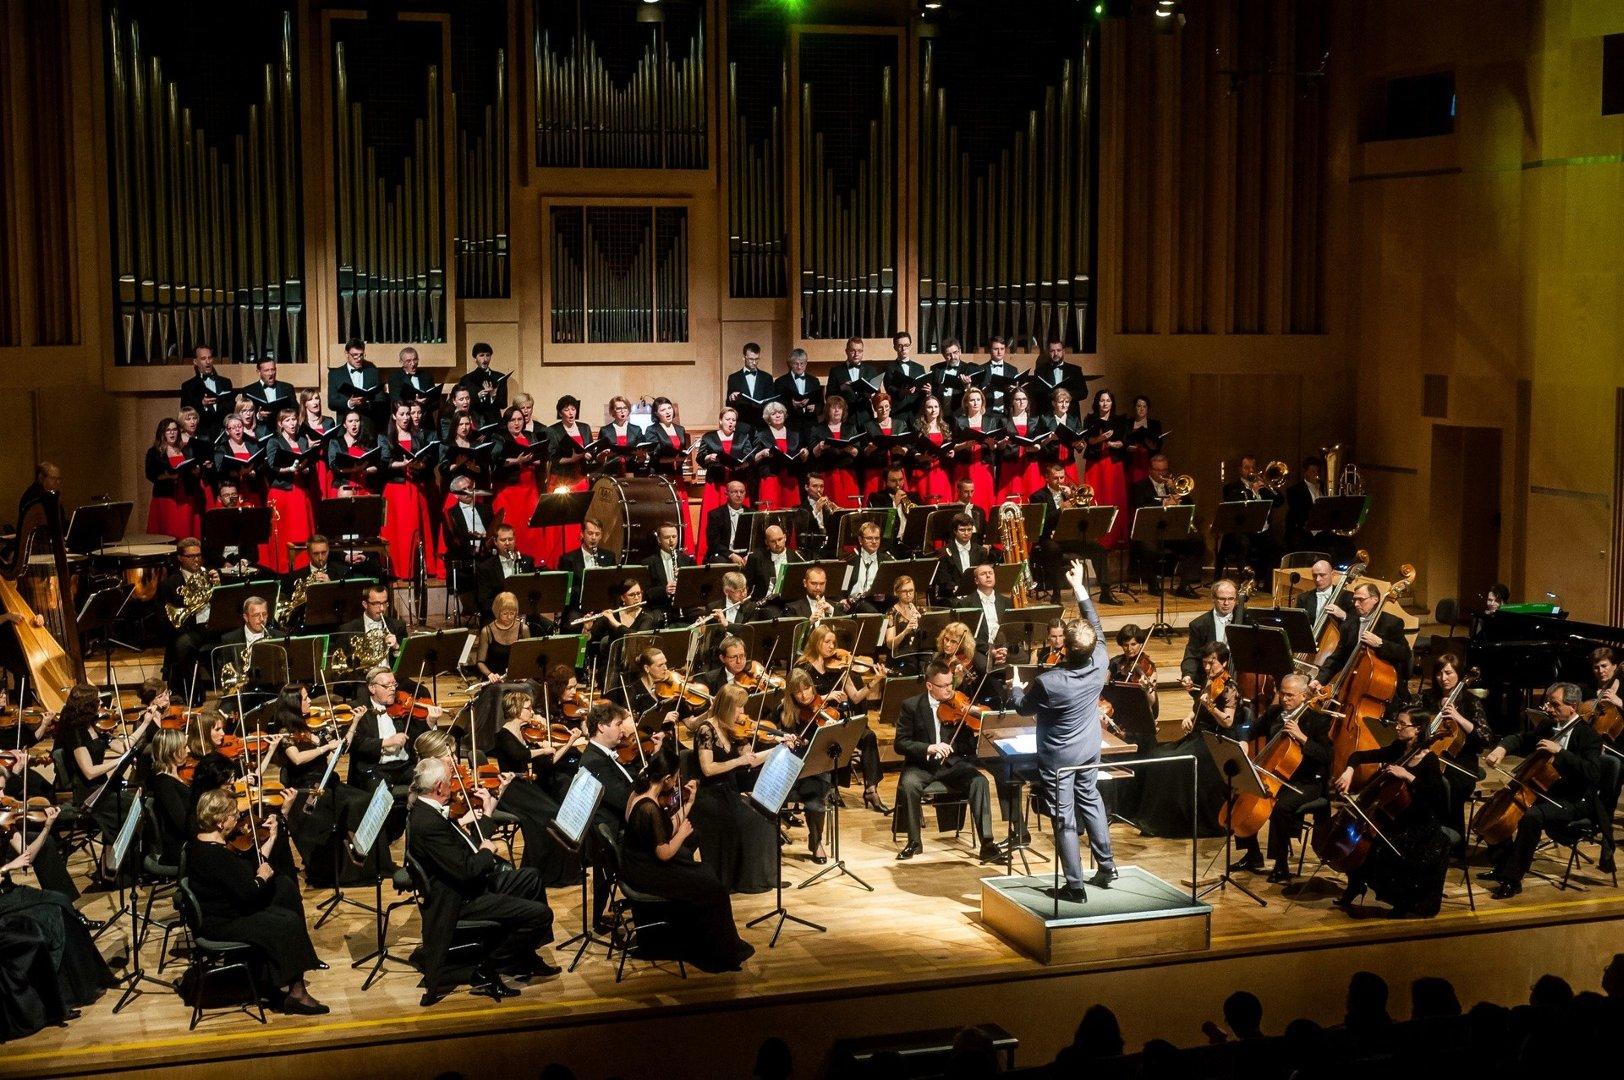 orkiestra filharmonii opolskiej festiwal beethoven glogowek